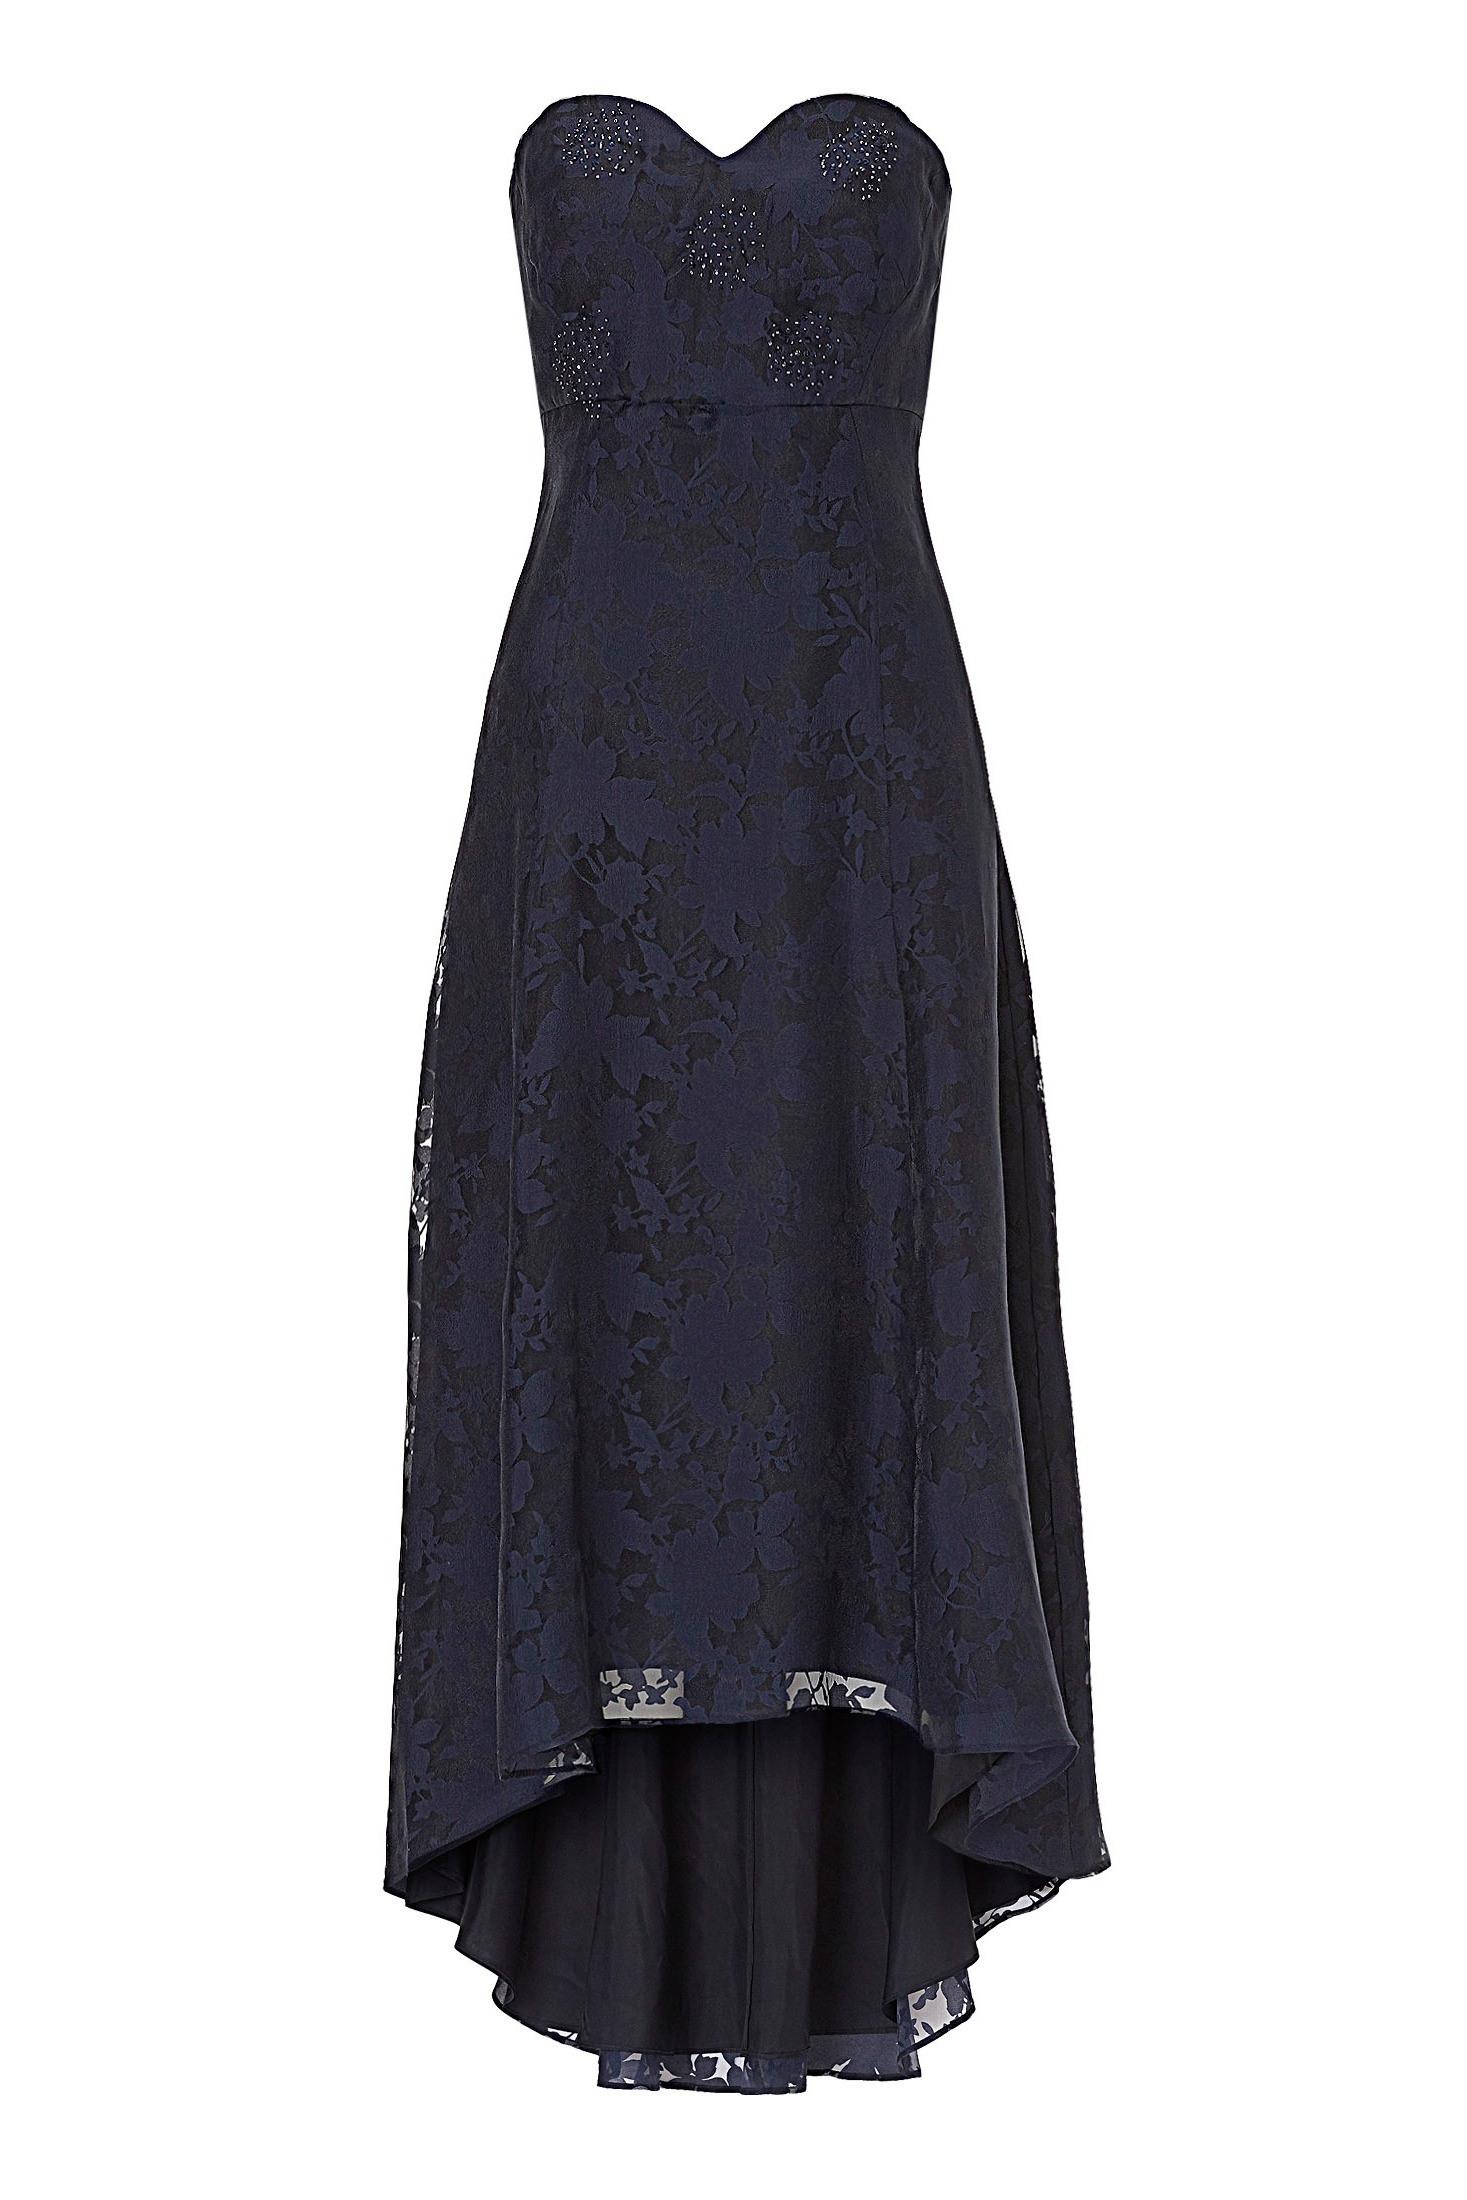 15 Cool Abendkleid Dunkelblau Lang für 201913 Wunderbar Abendkleid Dunkelblau Lang Galerie